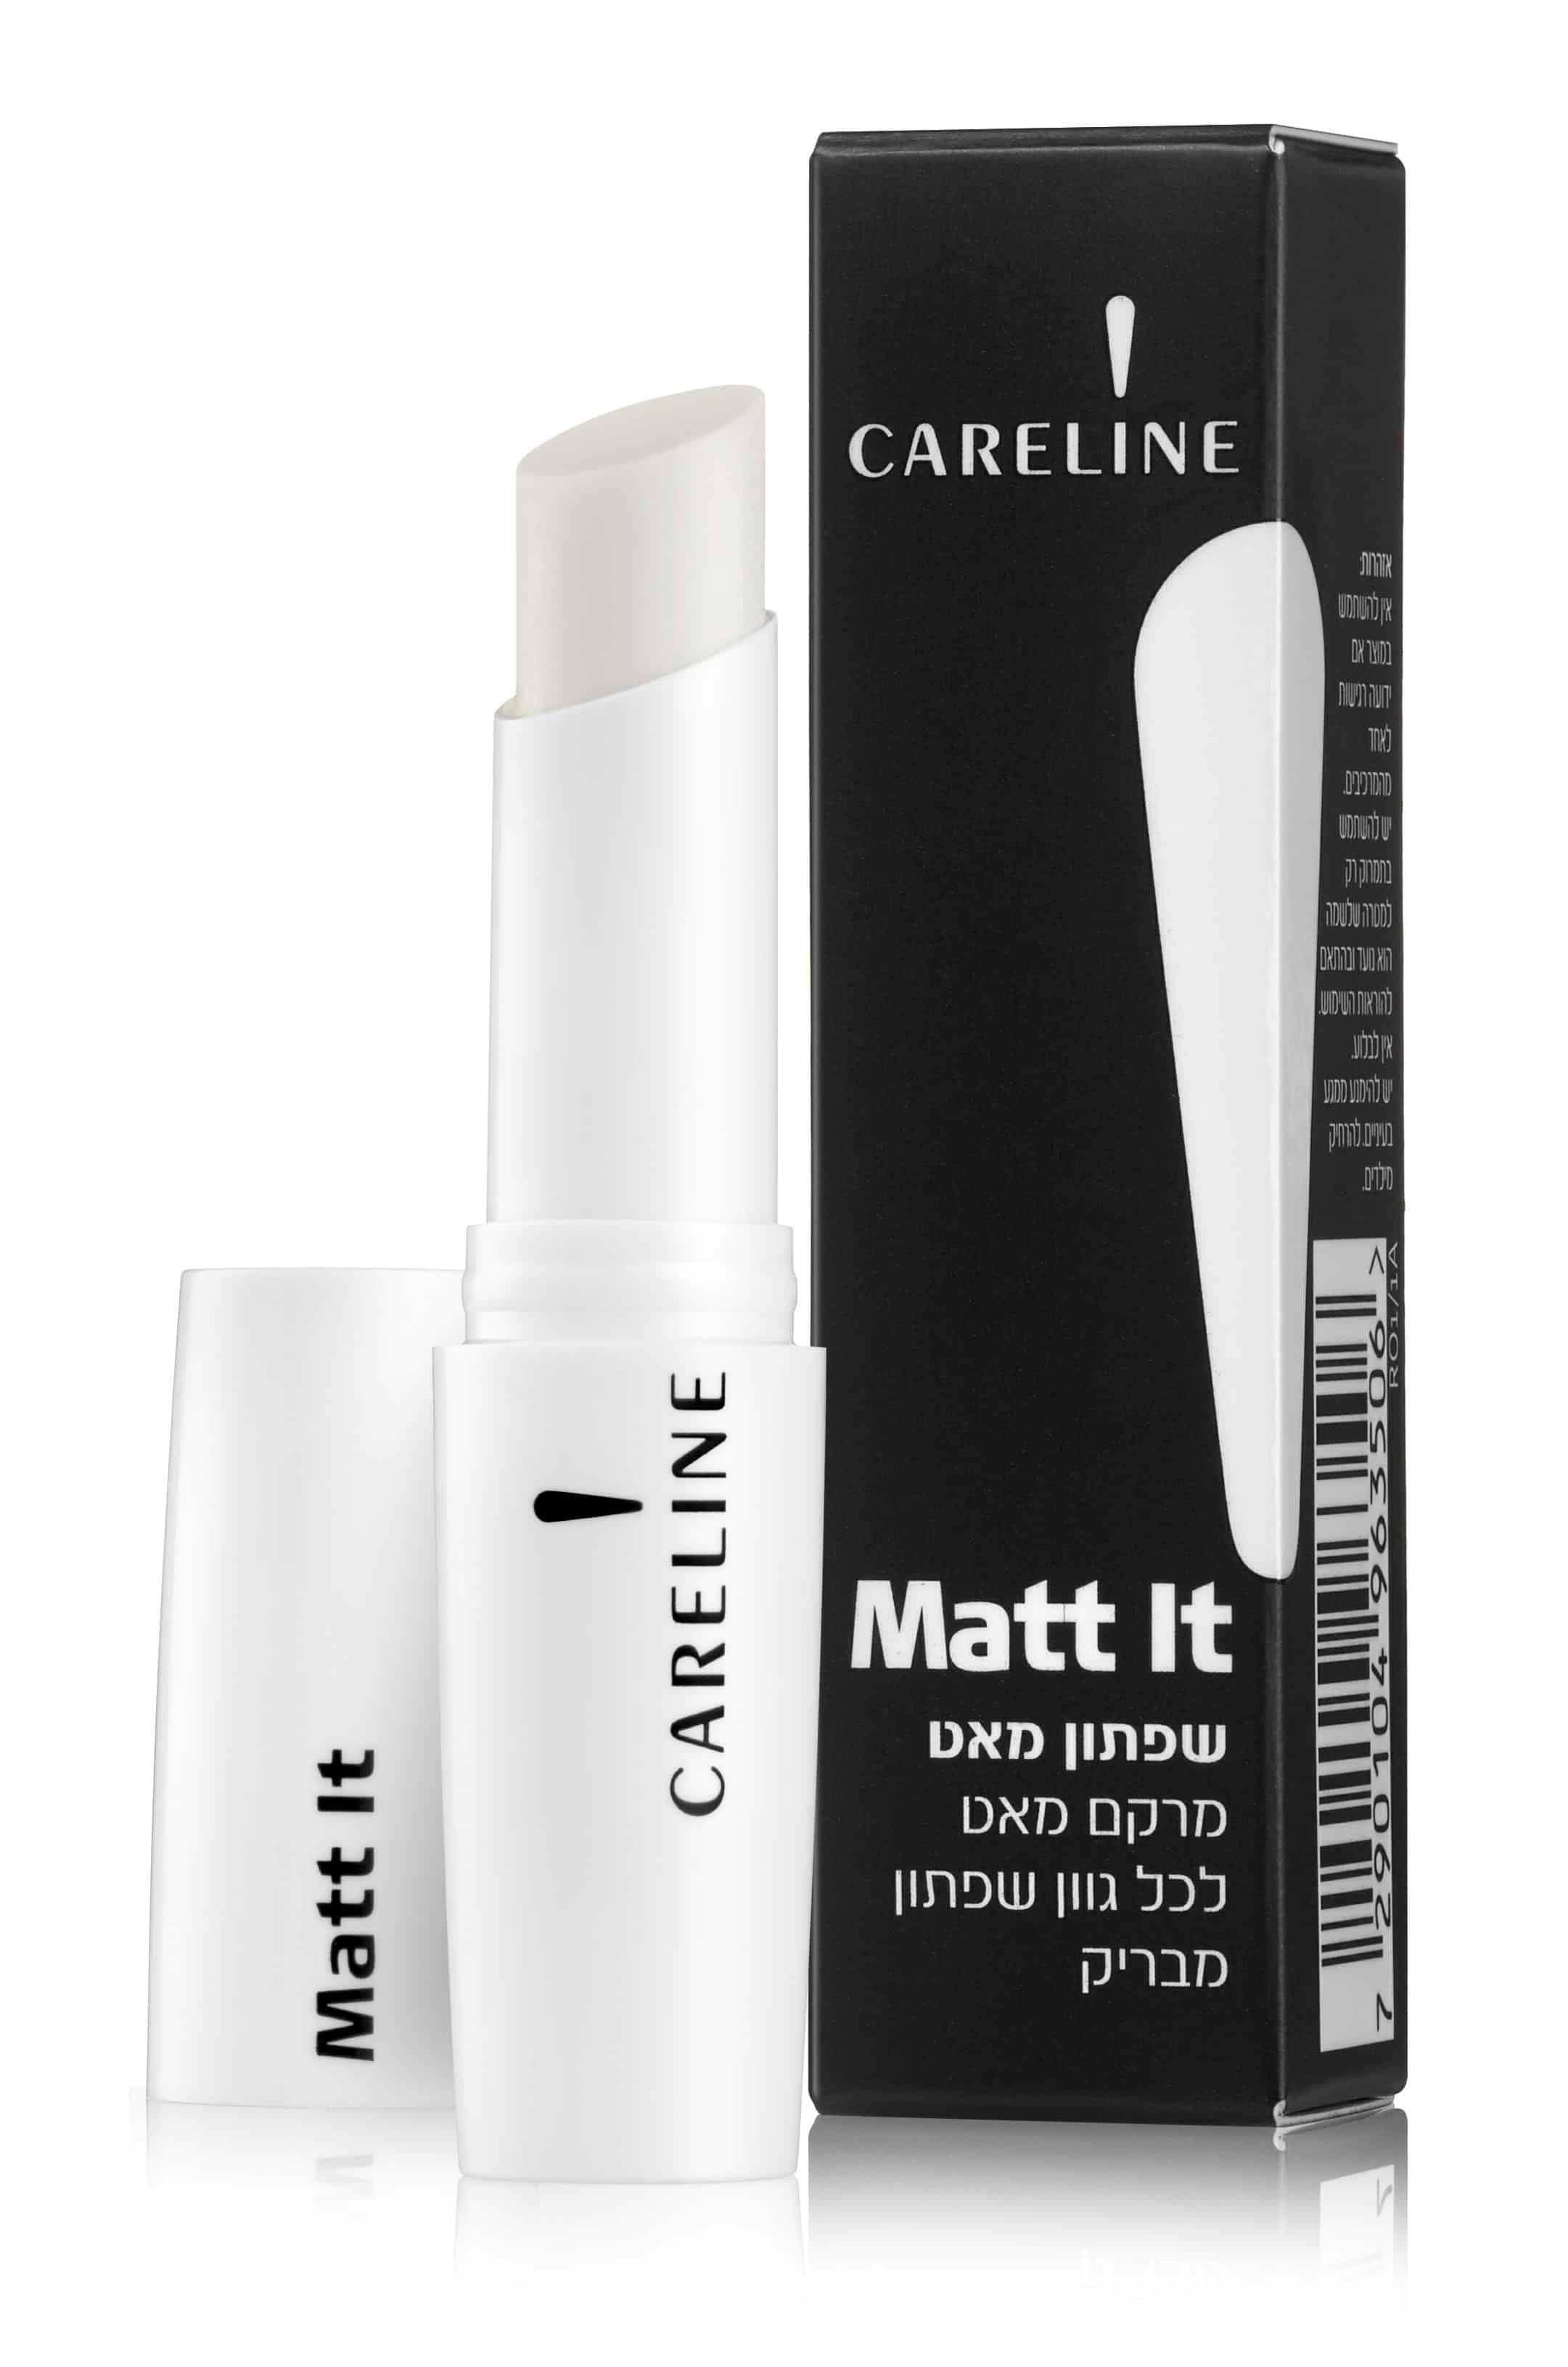 MATT IT שפתון מבית קרליין שקוף המעניק מרקם מאט לכל גוון שפתון מבריק מחיר 74.90 שח צילום מוטי פישביין (2)